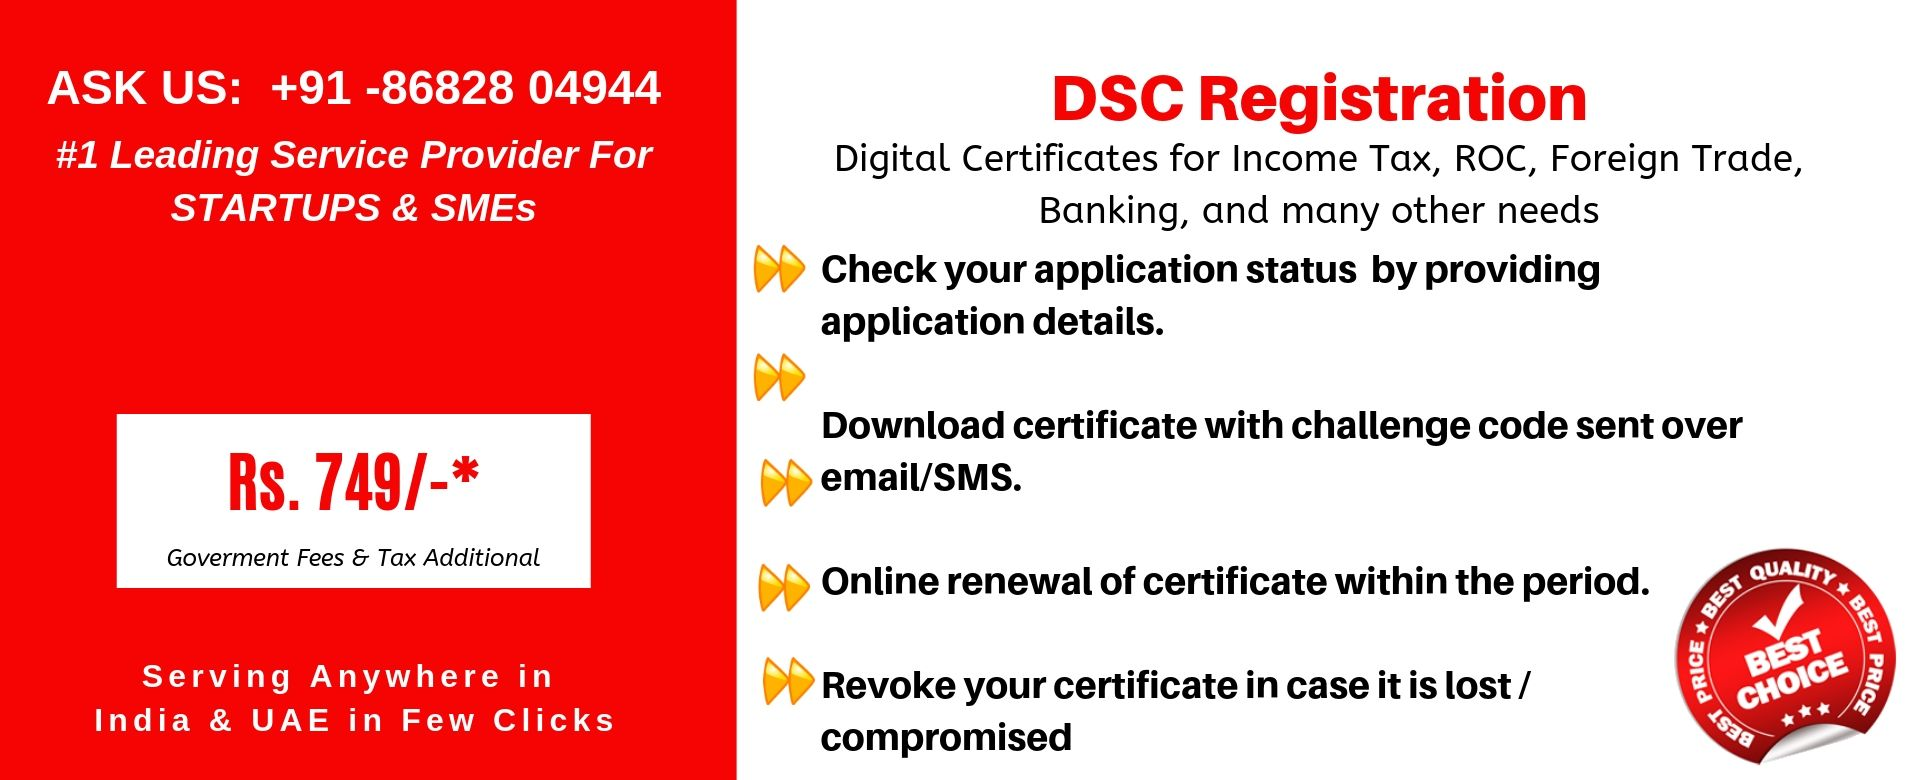 dsc registration in india